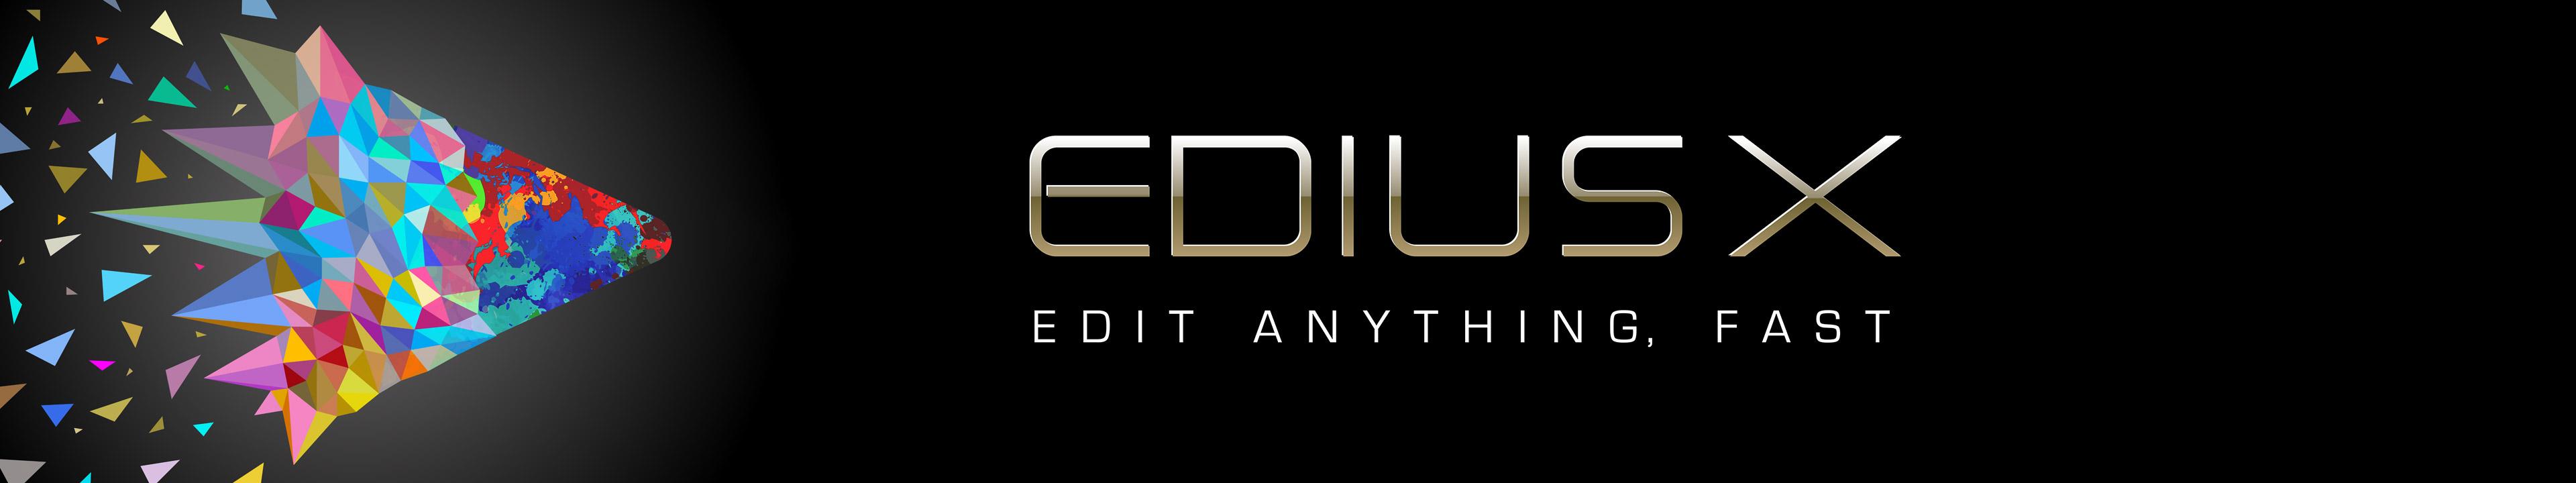 EDIUS X